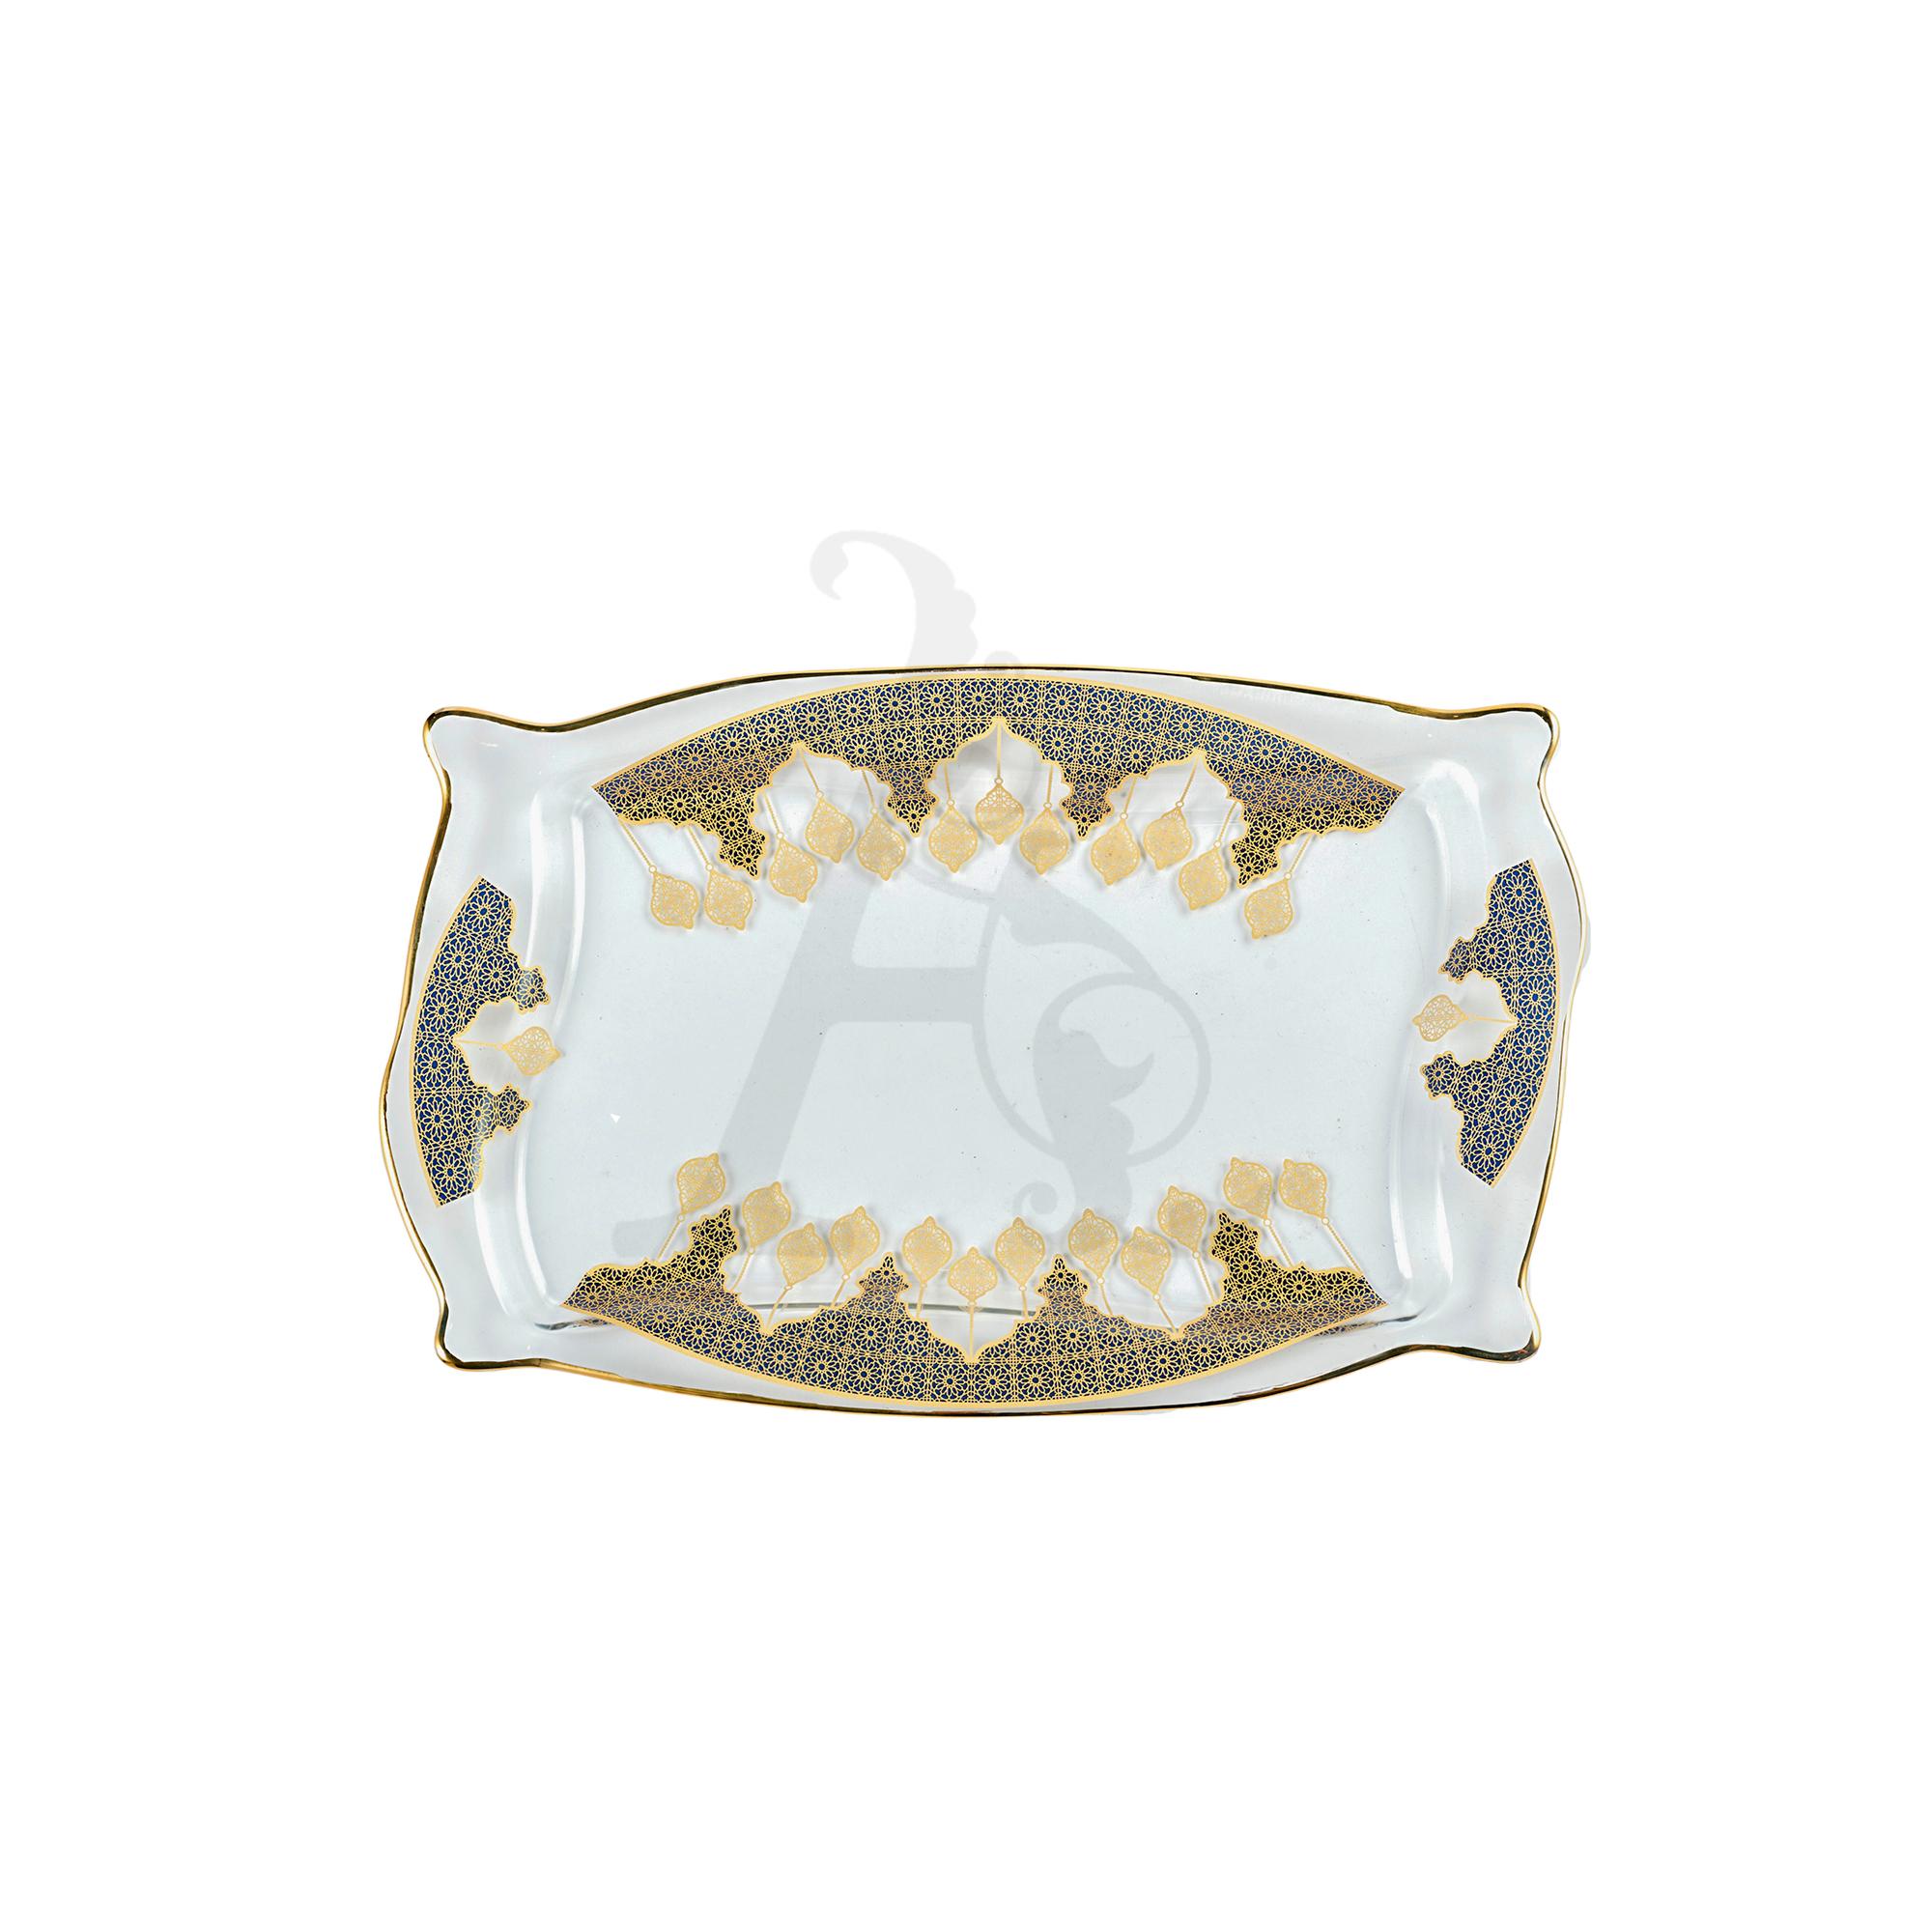 Buy Invitation Tempered Glass Plate Blue Border 10488